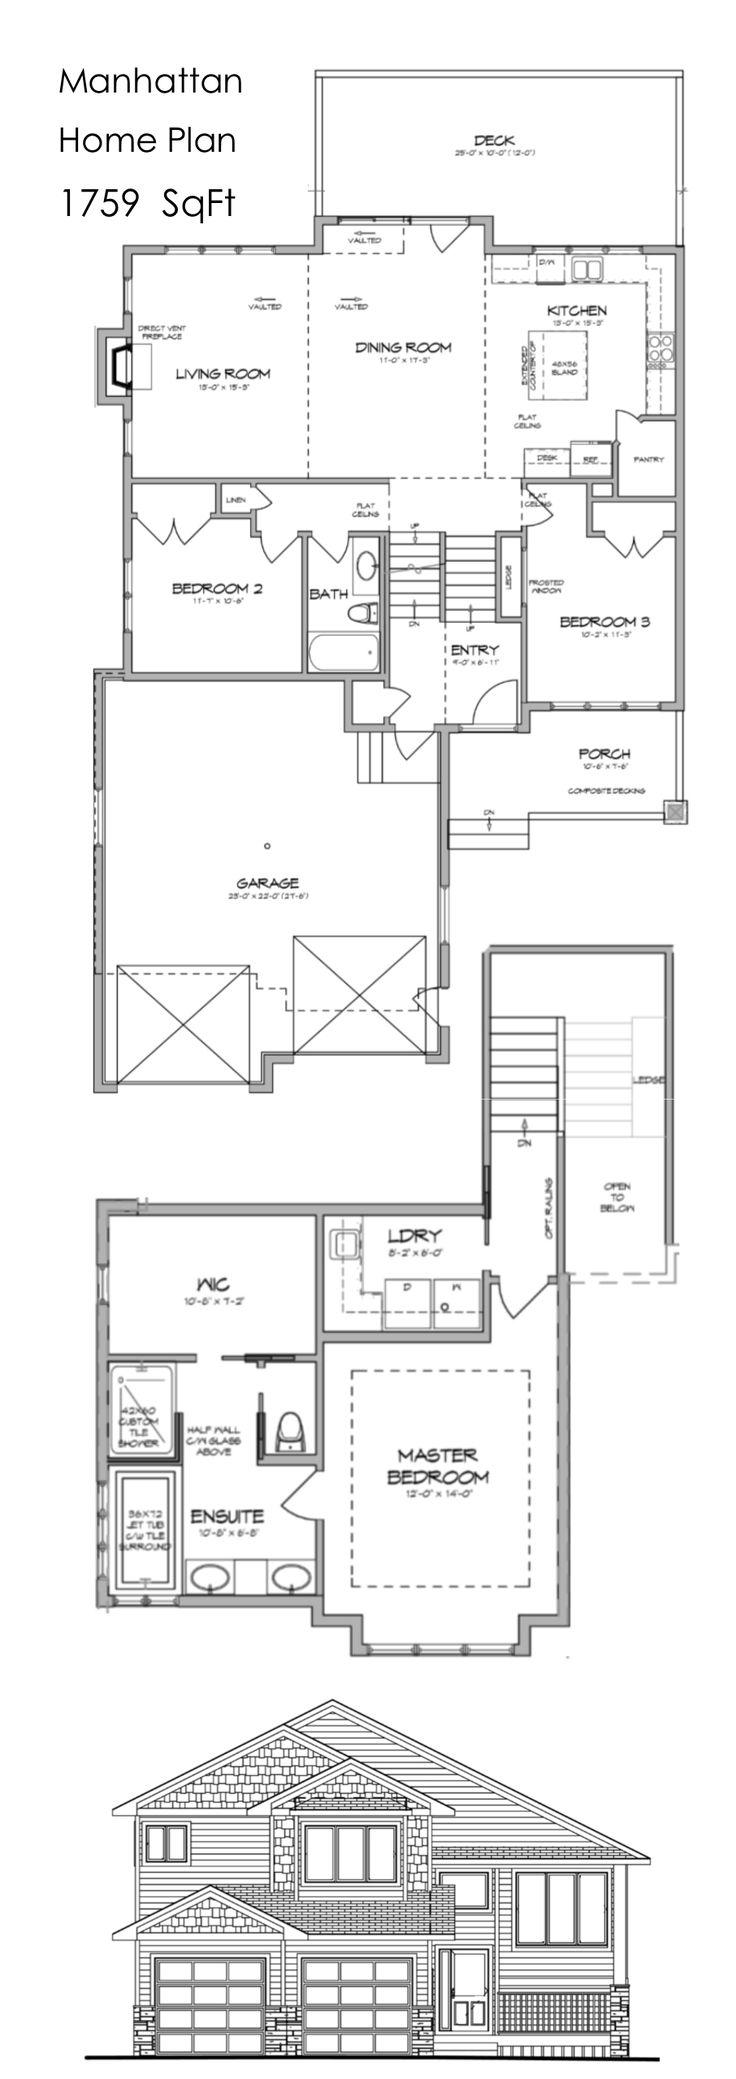 Manhattan home plan by Krest Homes  Central Alberta custom home builder